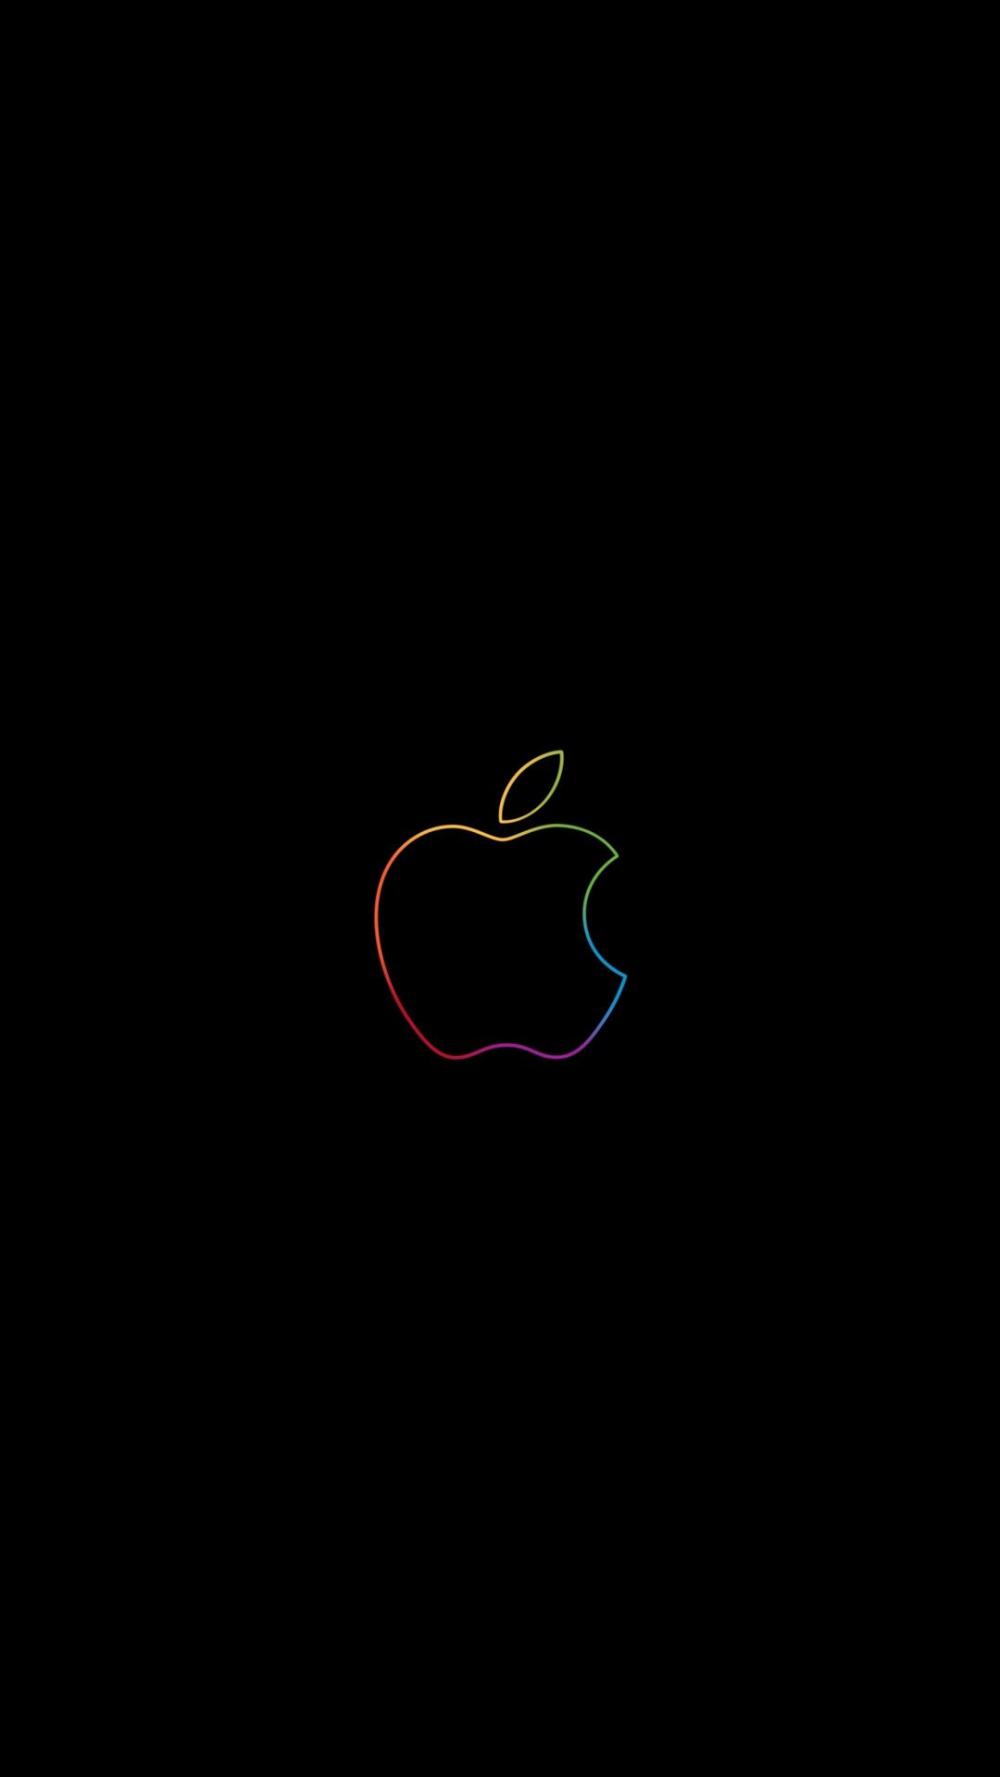 Apple Logo Wallpaper Wallpaper Apel Ilustrasi 3d Seni